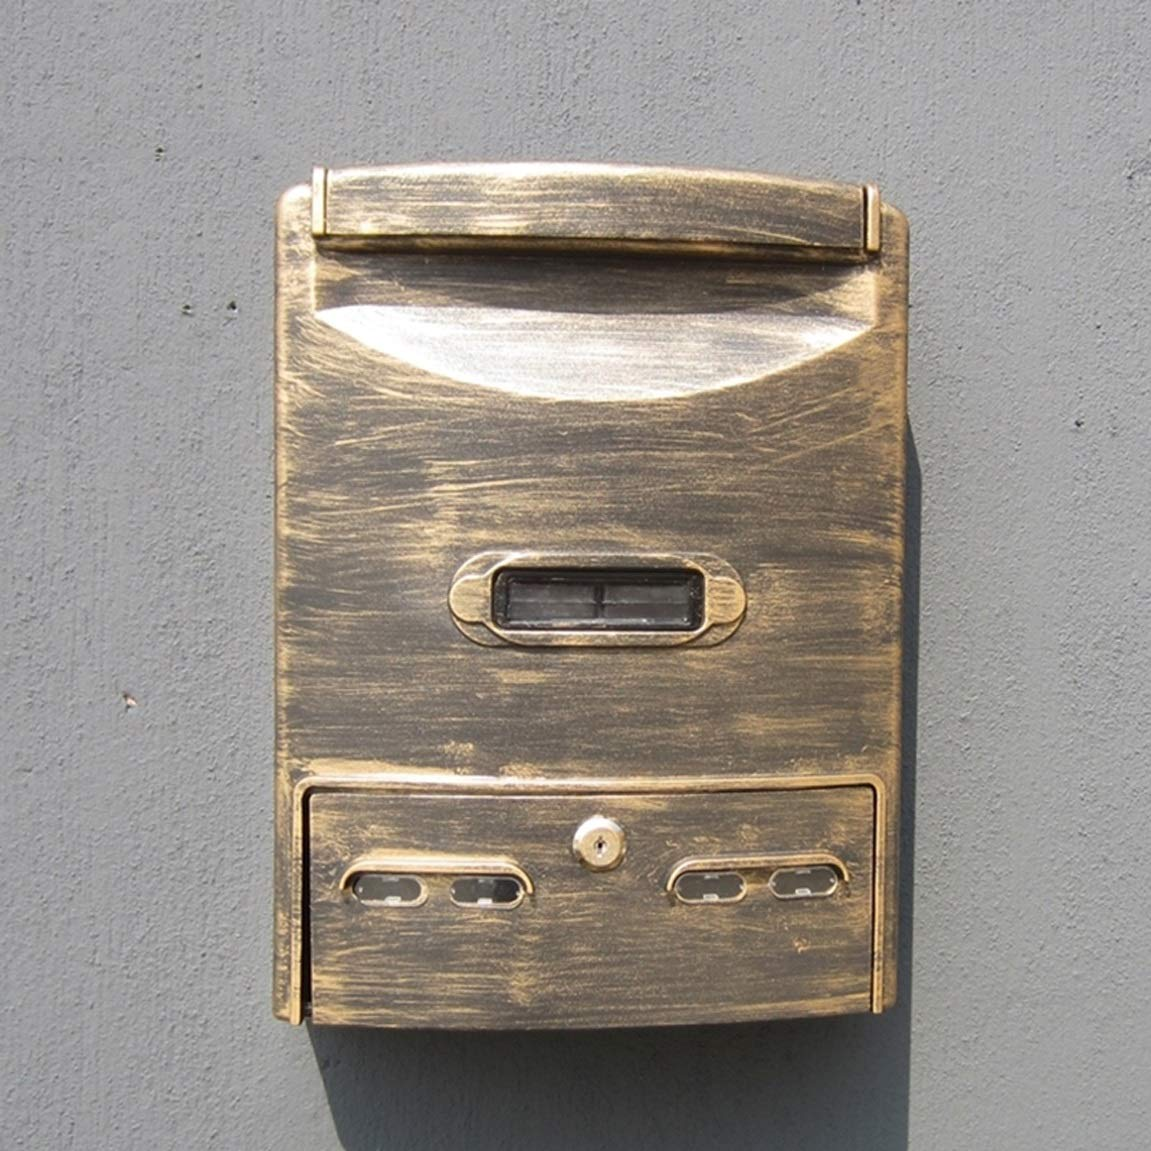 HLQW ヨーロッパのレターボックスRainproof屋外の壁ハンギングコレクションボックス模造の古代金   B07JLPDN8W